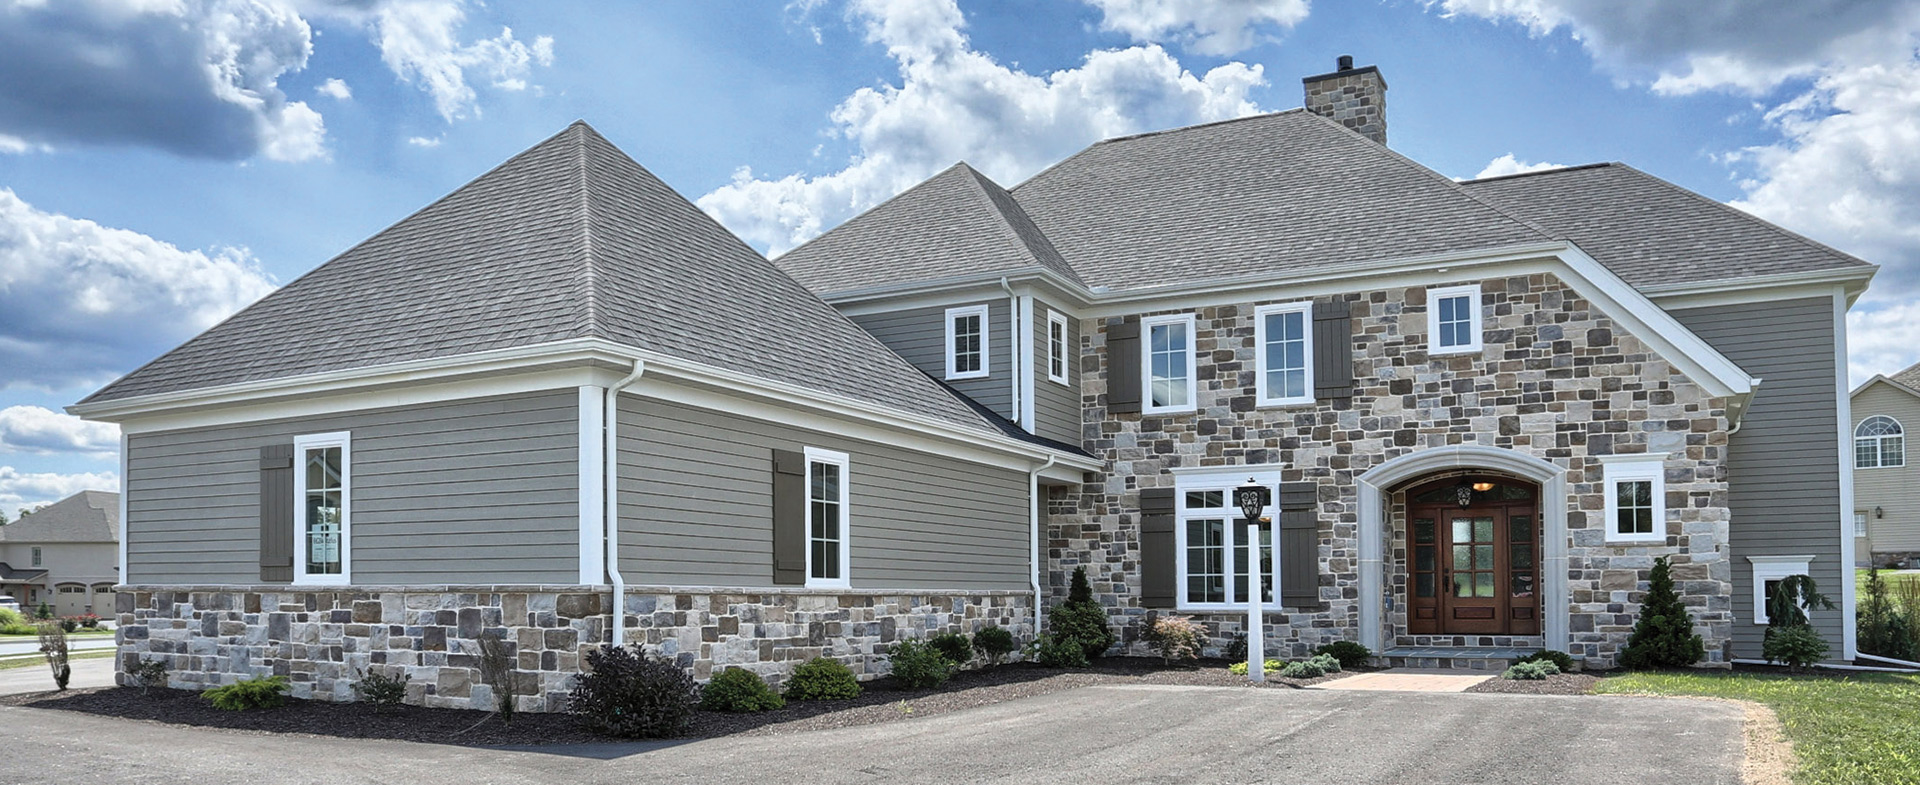 York PA Home Builders– EGStoltzfus Homes